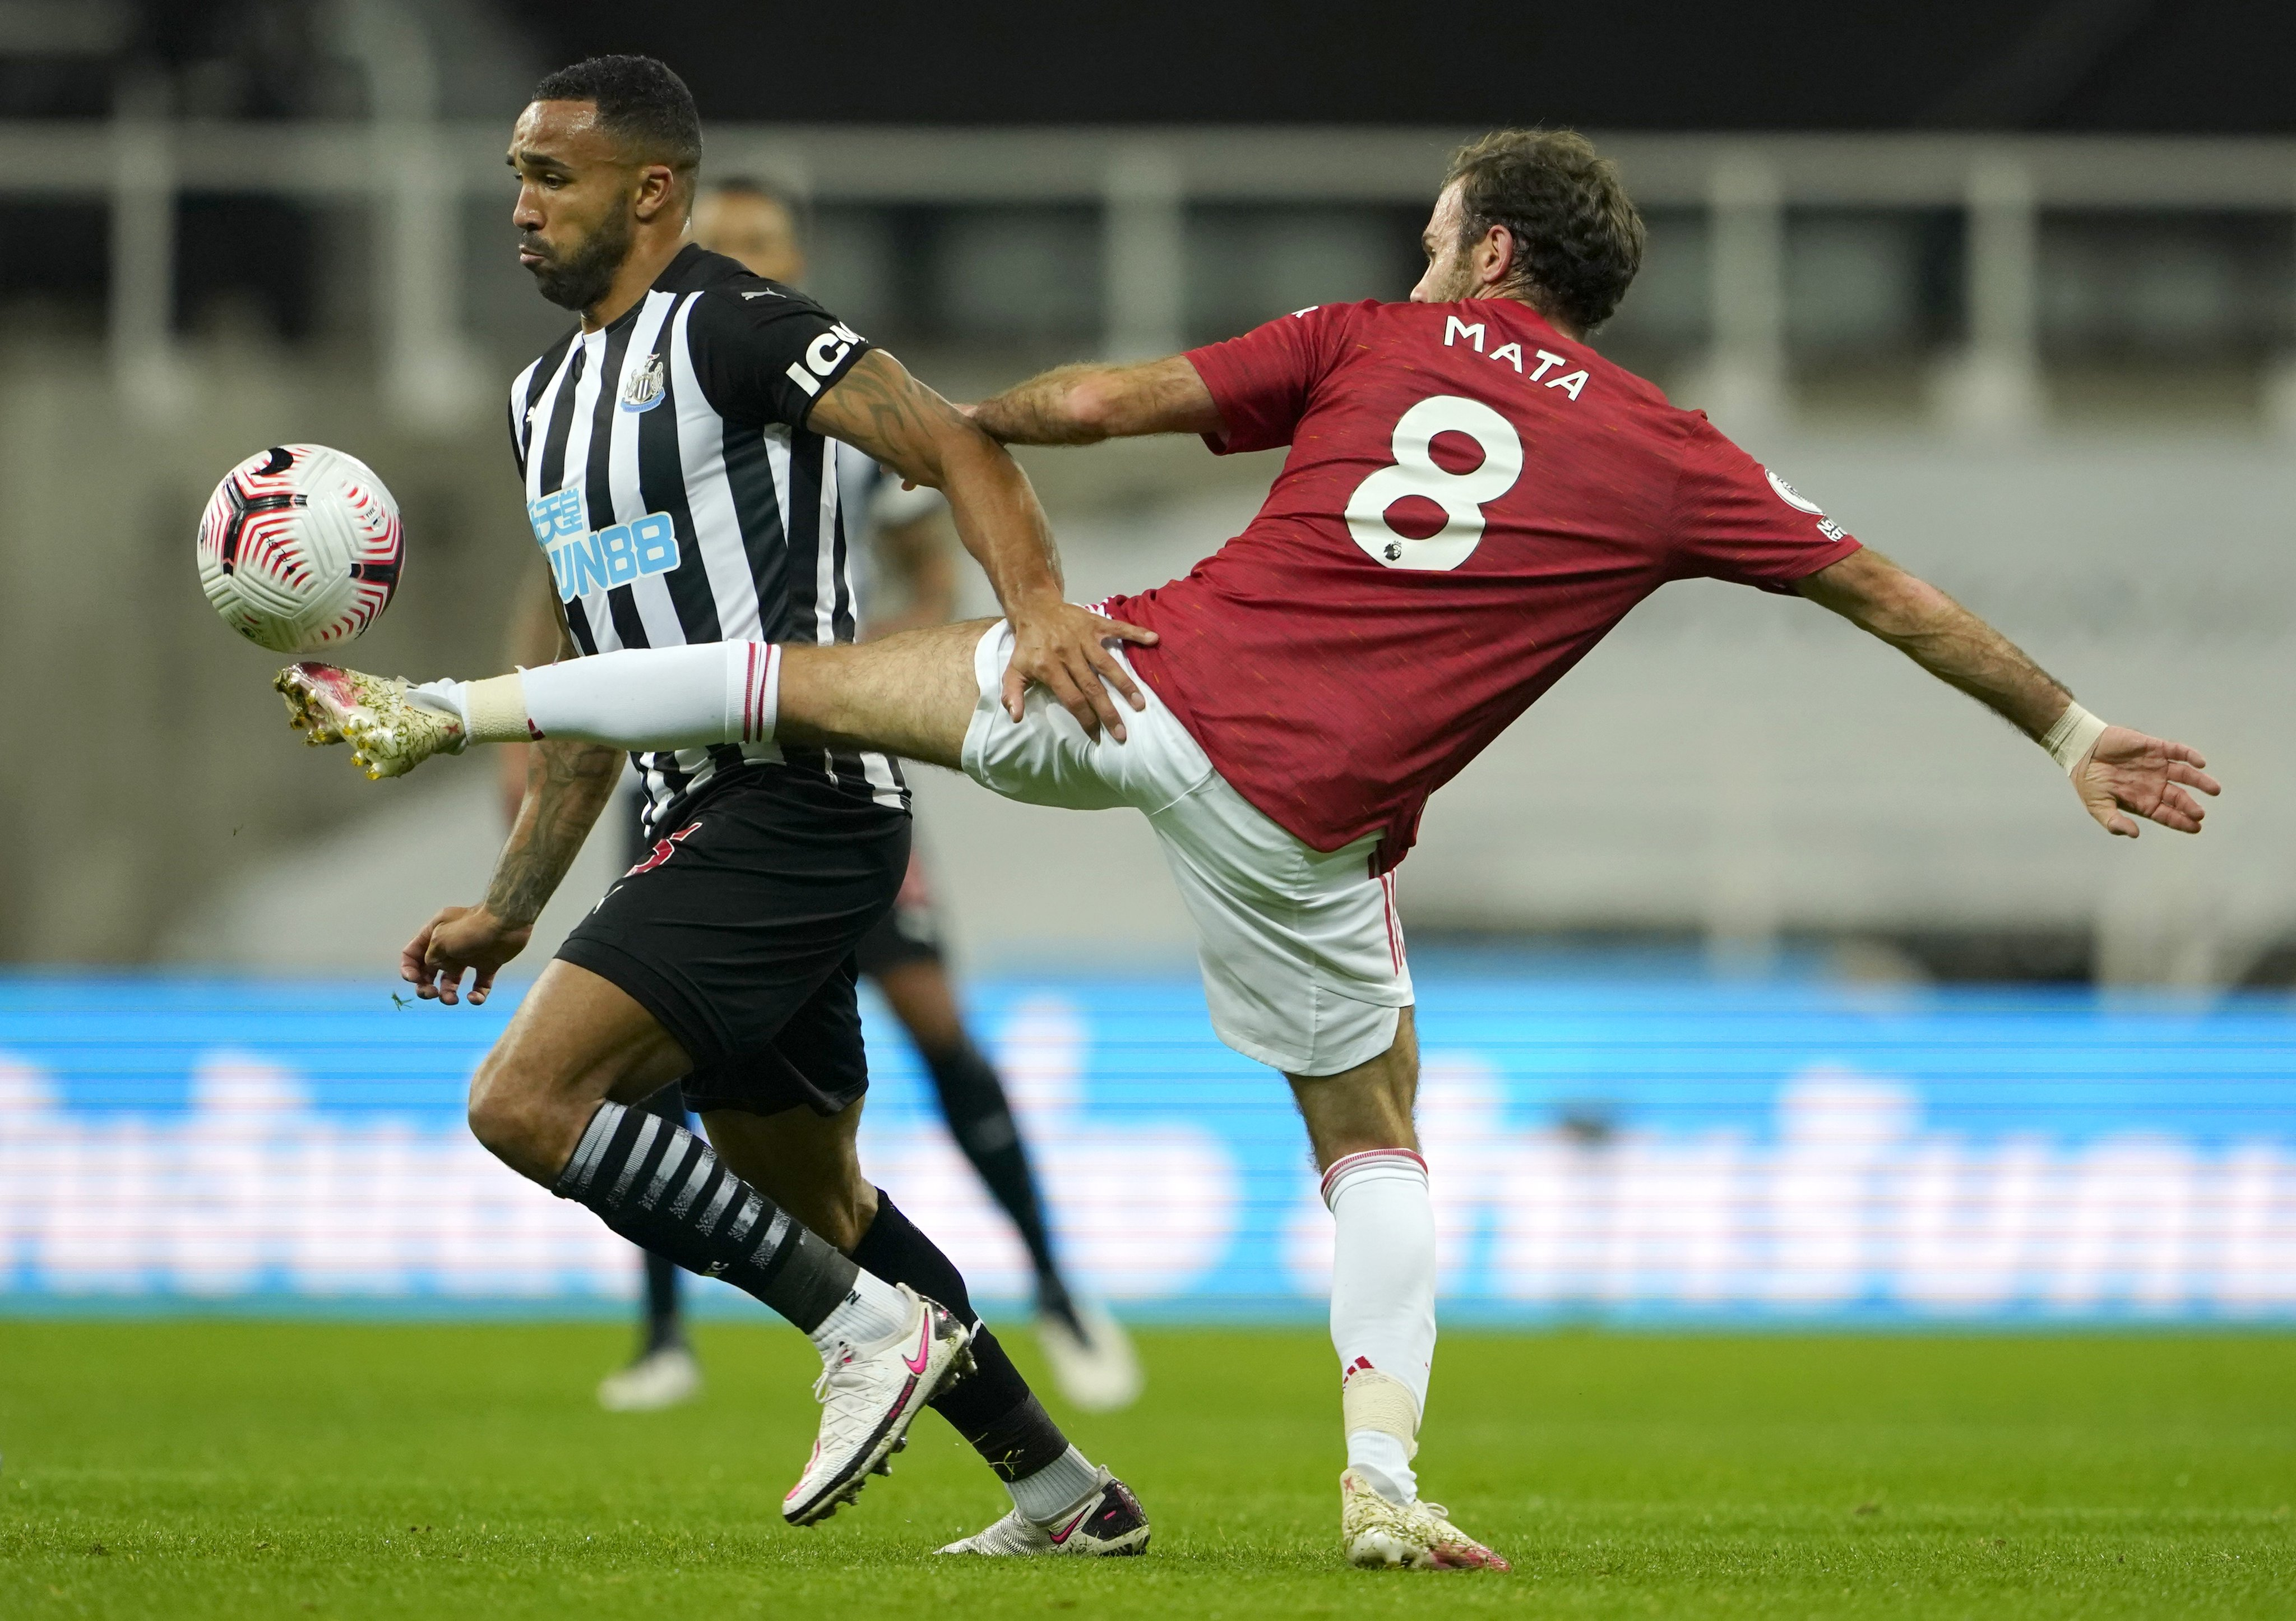 نيوكاسل ضد مان يونايتد (2)